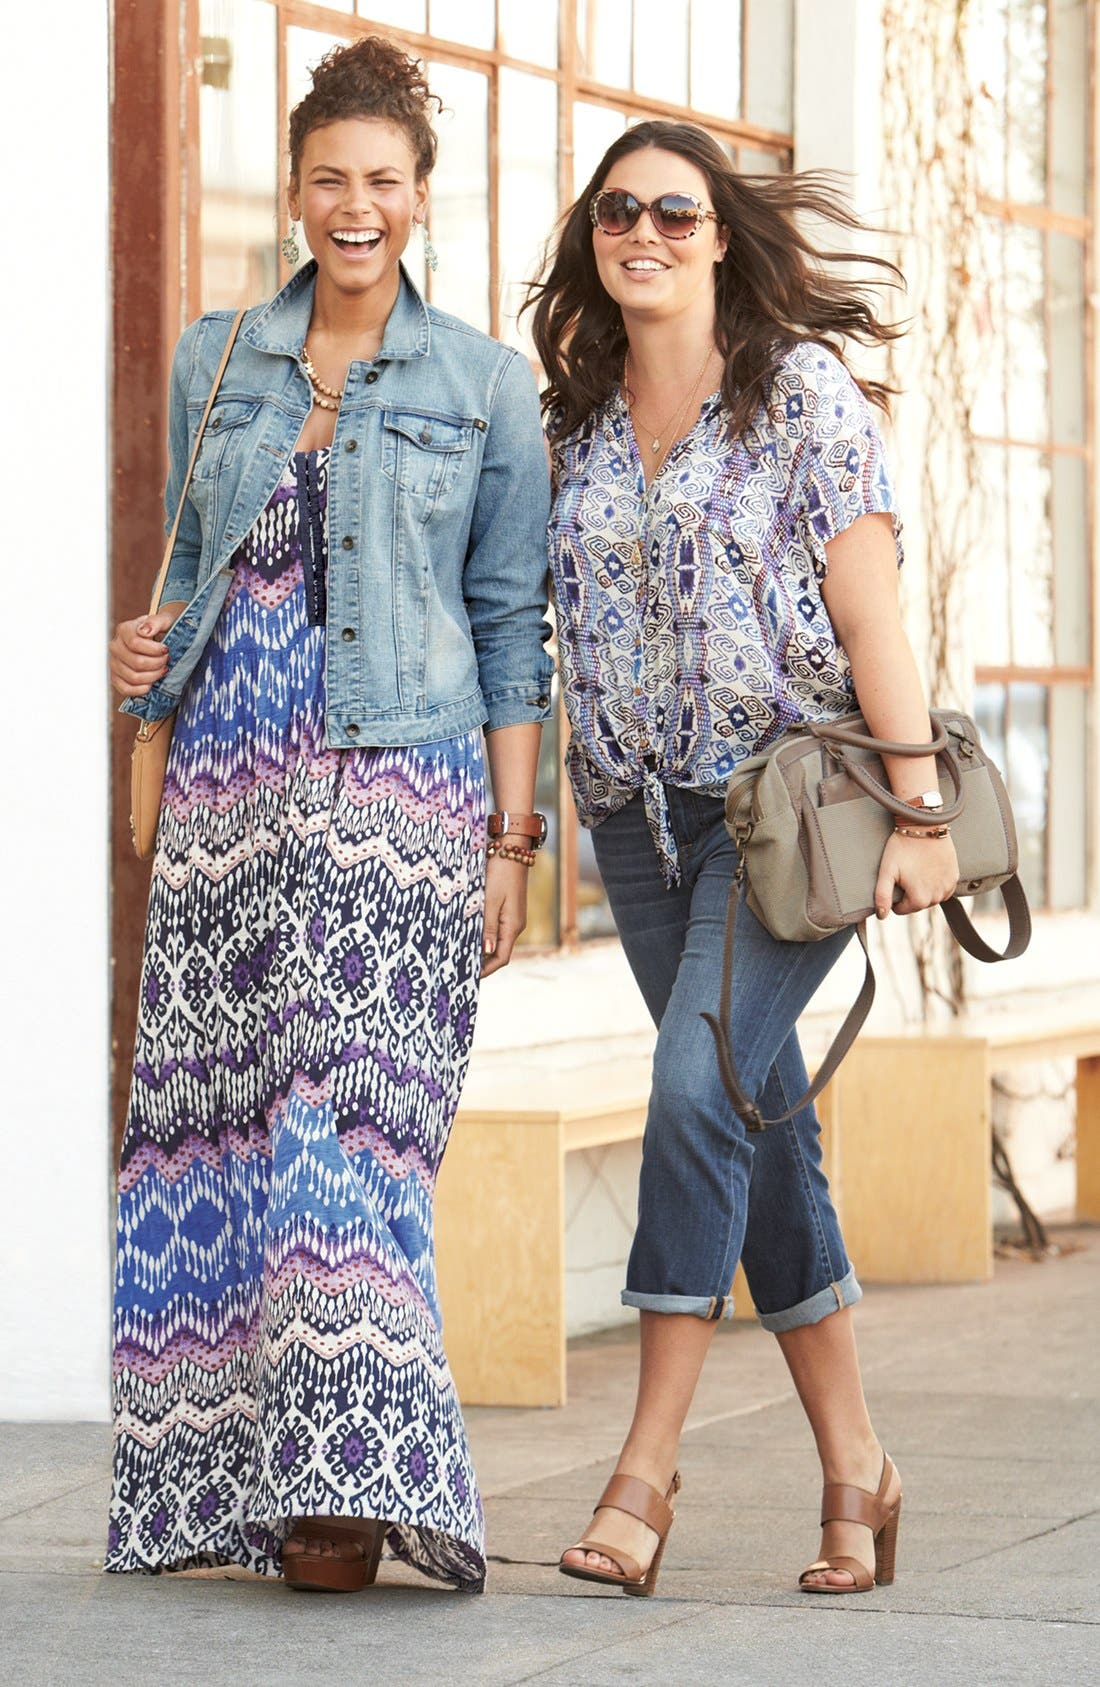 Main Image - Lucky Brand Denim Jacket & Maxi Dress